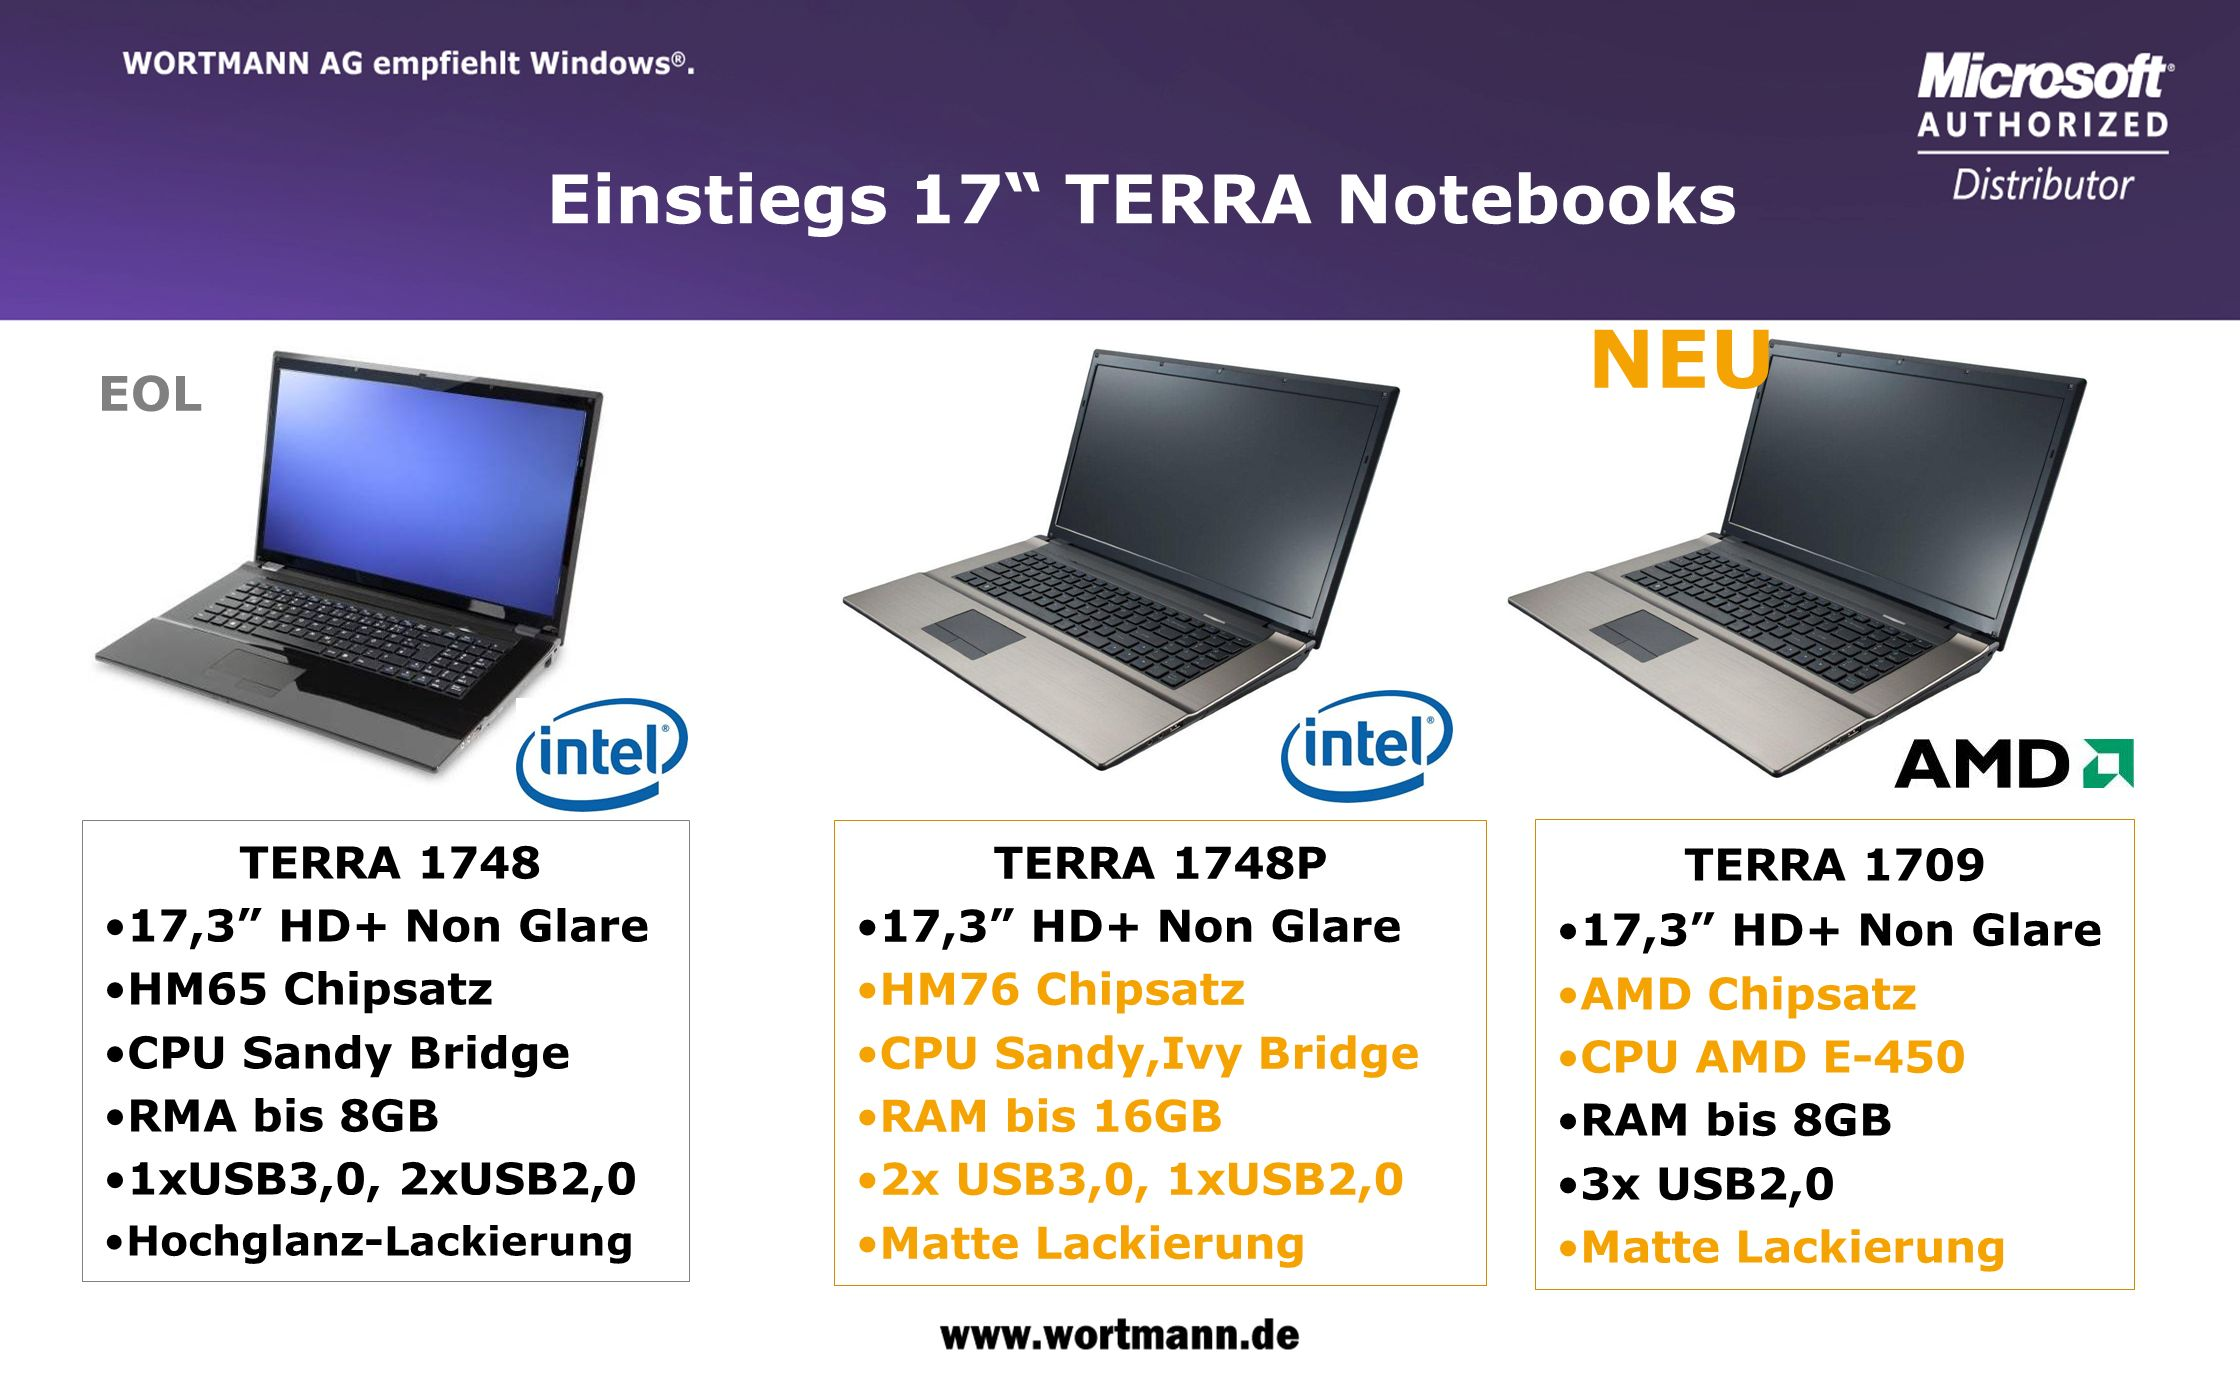 www.wortmann.de TERRA INDUSTRY PAD 10 WSVGA (1024x768) Non Glare Convertible Display, Touch Screen Intel ATOM N450 CPU WLAN 1,3M Camera TERRA INDUSTRY PAD II 10 WSVGA (1024x768) Non Glare Convertible Display, Touch Screen Intel ATOM N2600 CPU WLAN & Bluetooth,UMTS 2,0M Camera NEU EOL